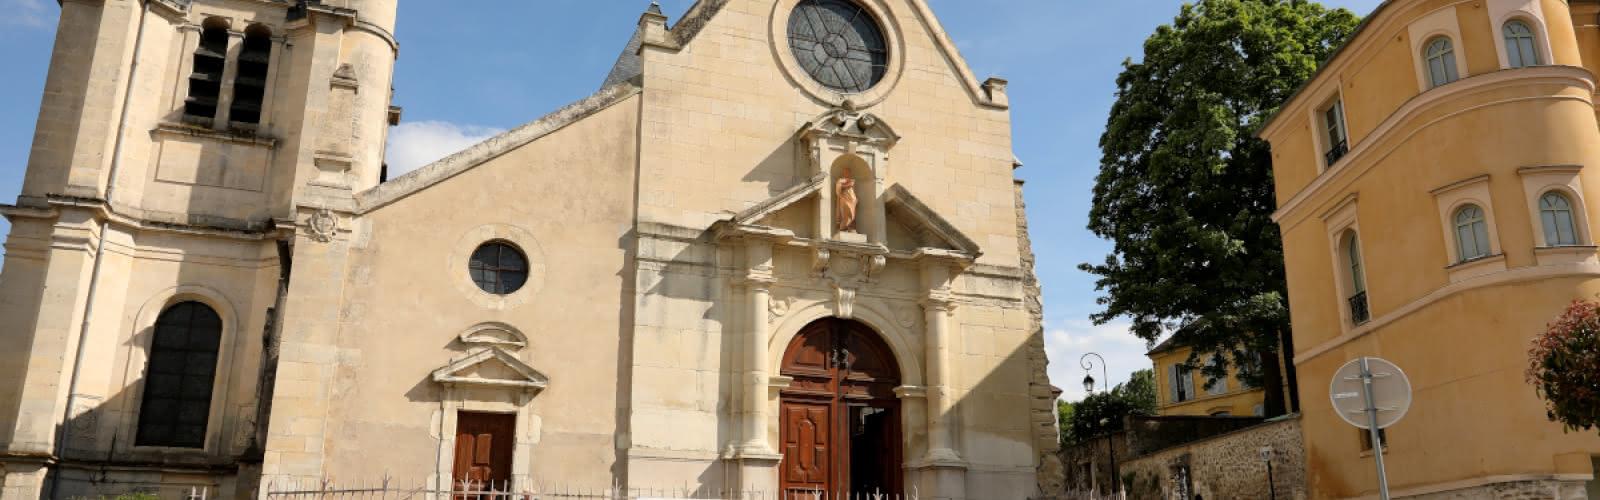 Eglise Saint-Acceul